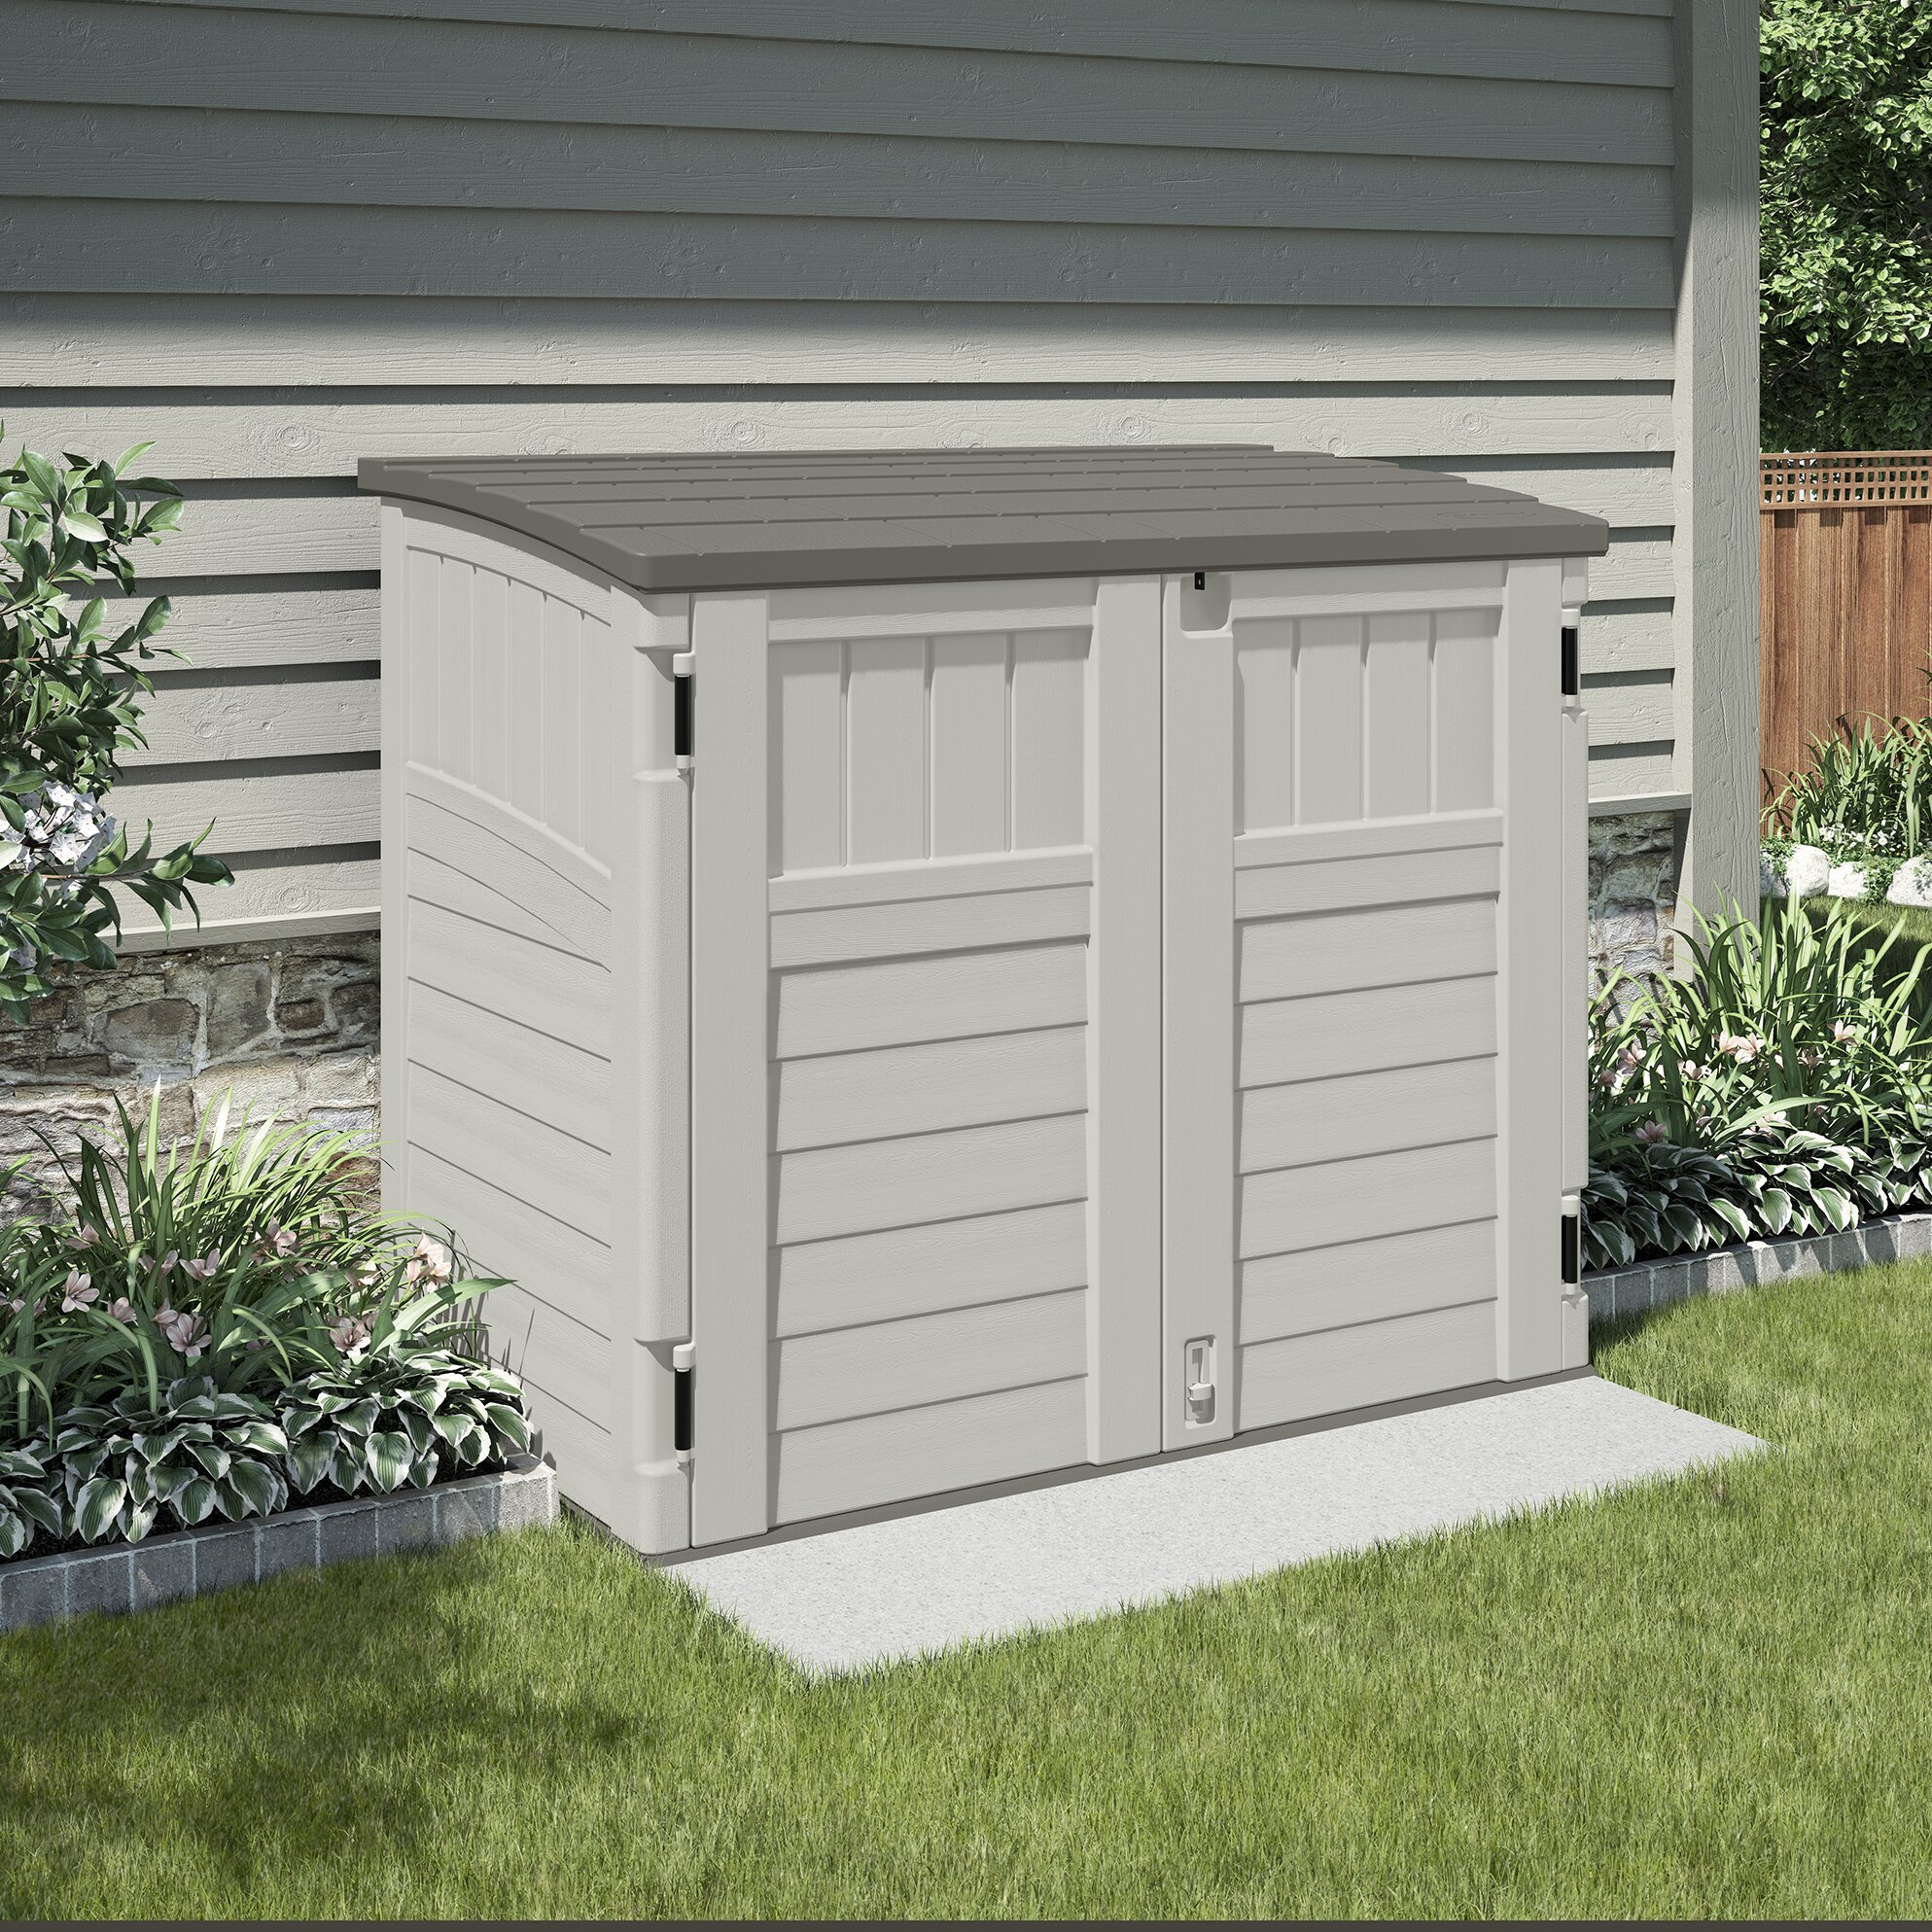 Suncast utility 4 ft w x 3 ft d plastic tool shed for Caseta jardin pvc